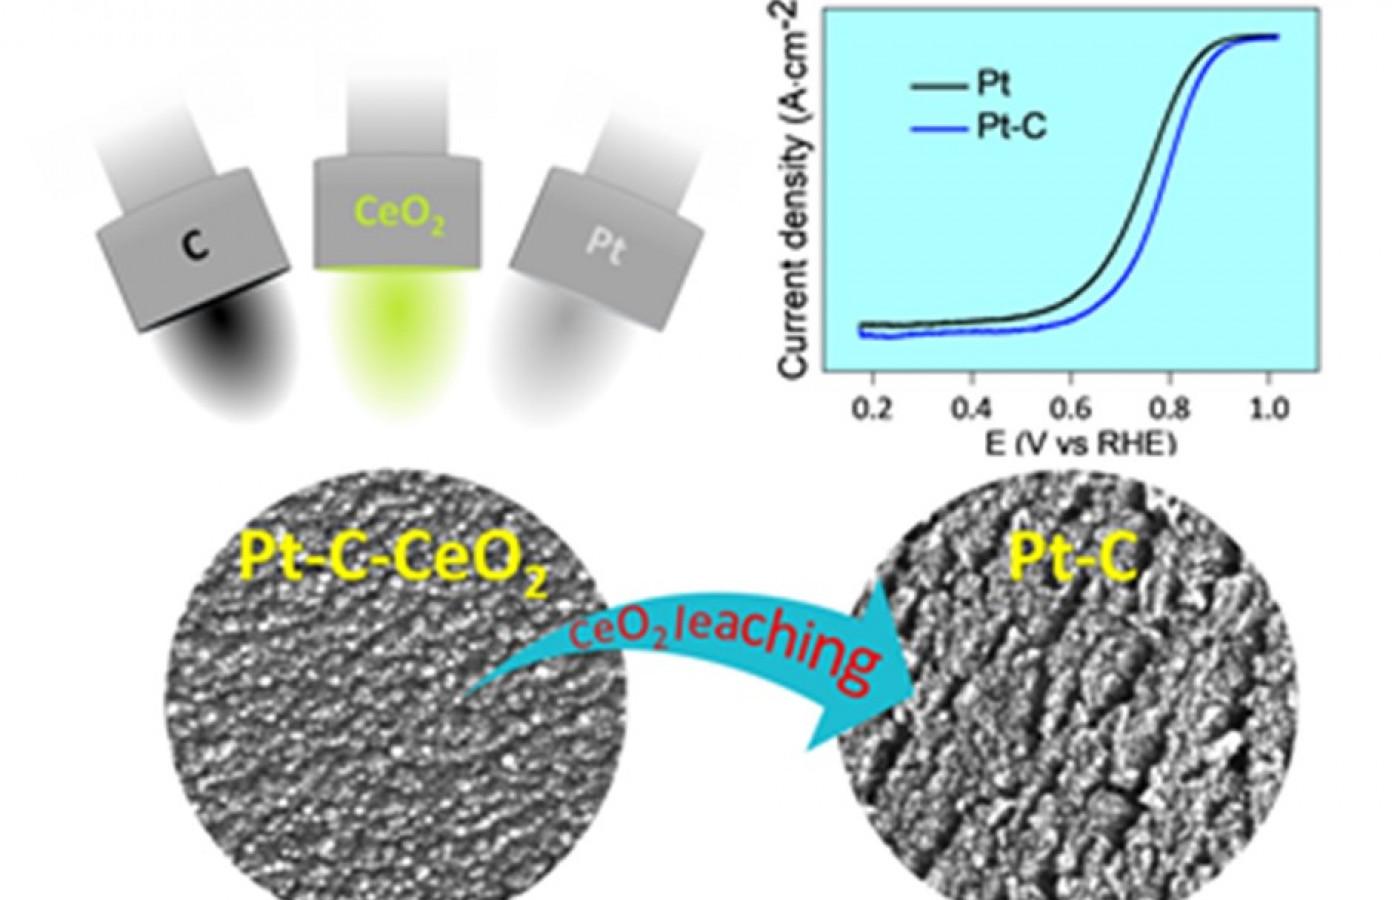 New way of preparation of nanoporous electrocatalysts